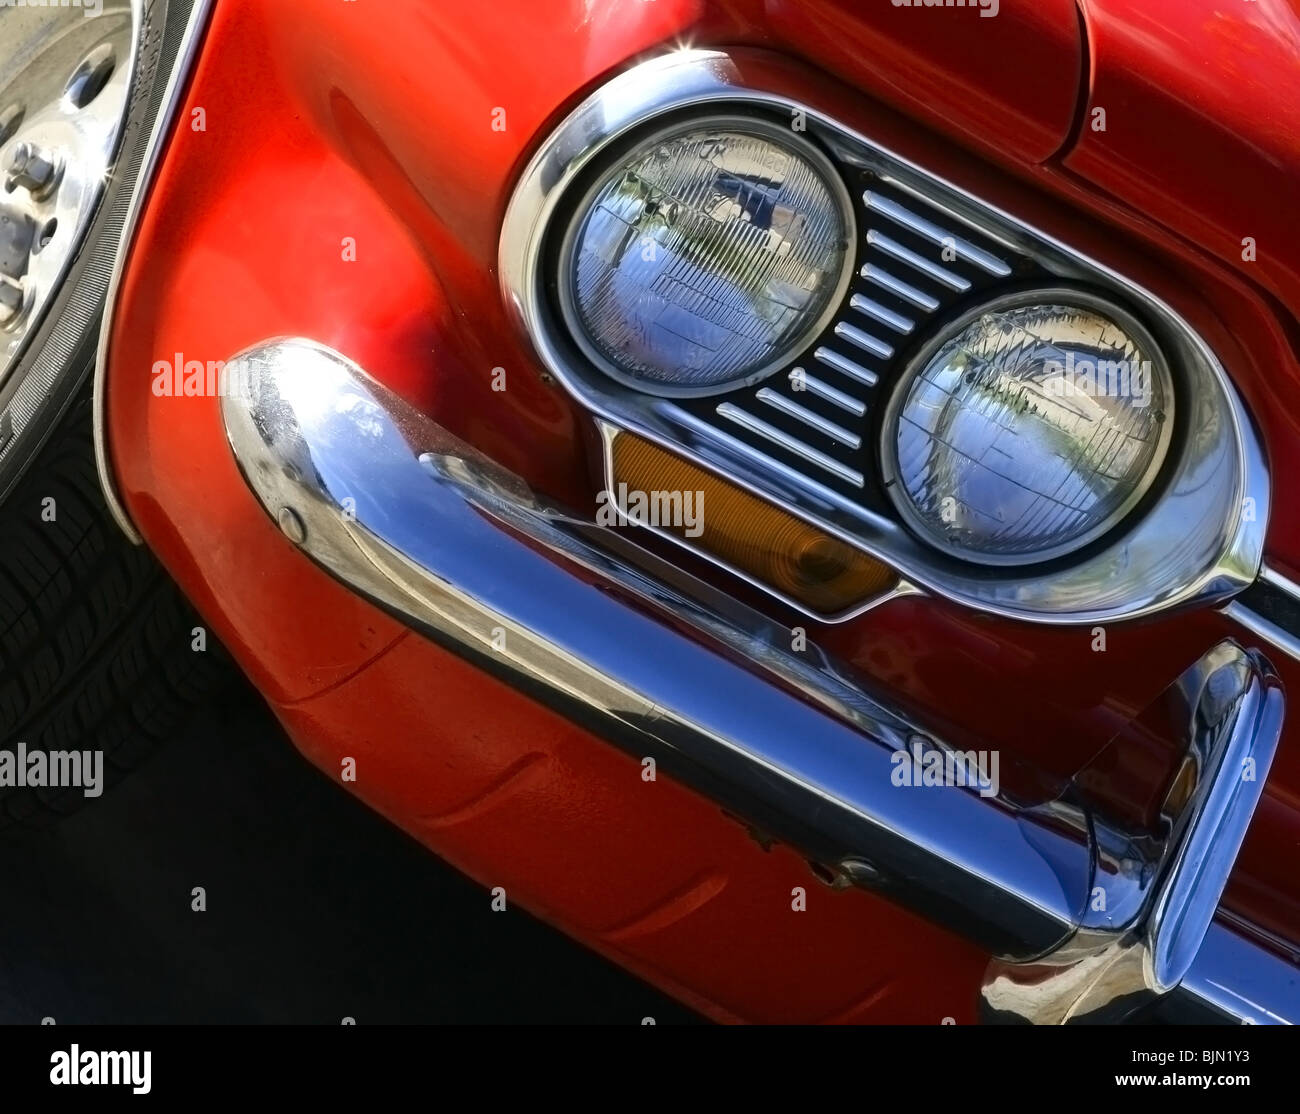 Automotive Memorabilia Stock Photos & Automotive Memorabilia Stock ...